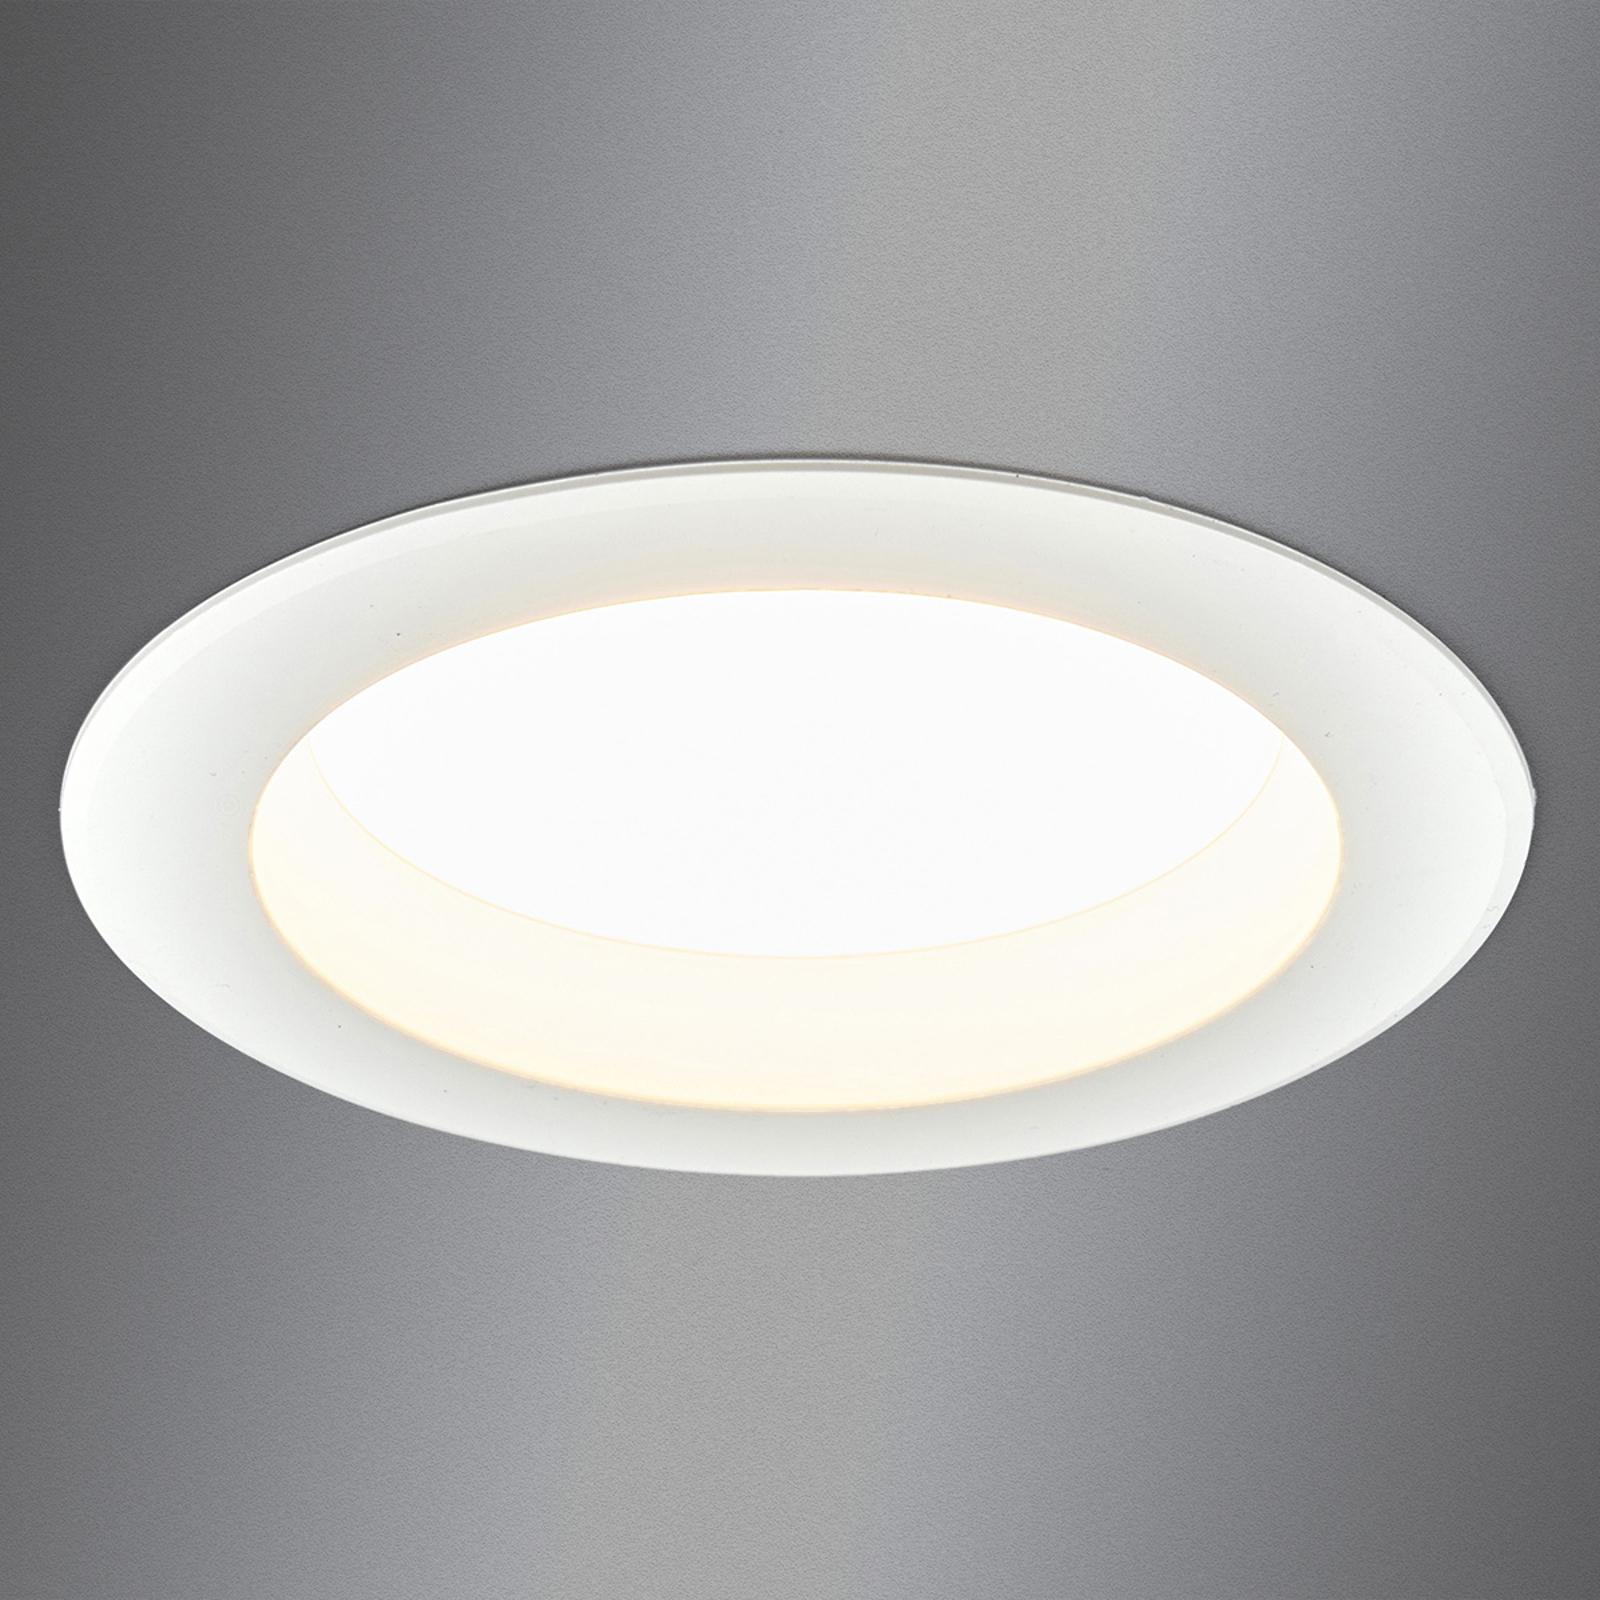 Krachtige LED inbouwlamp Arian, 14,5cm 12,5W